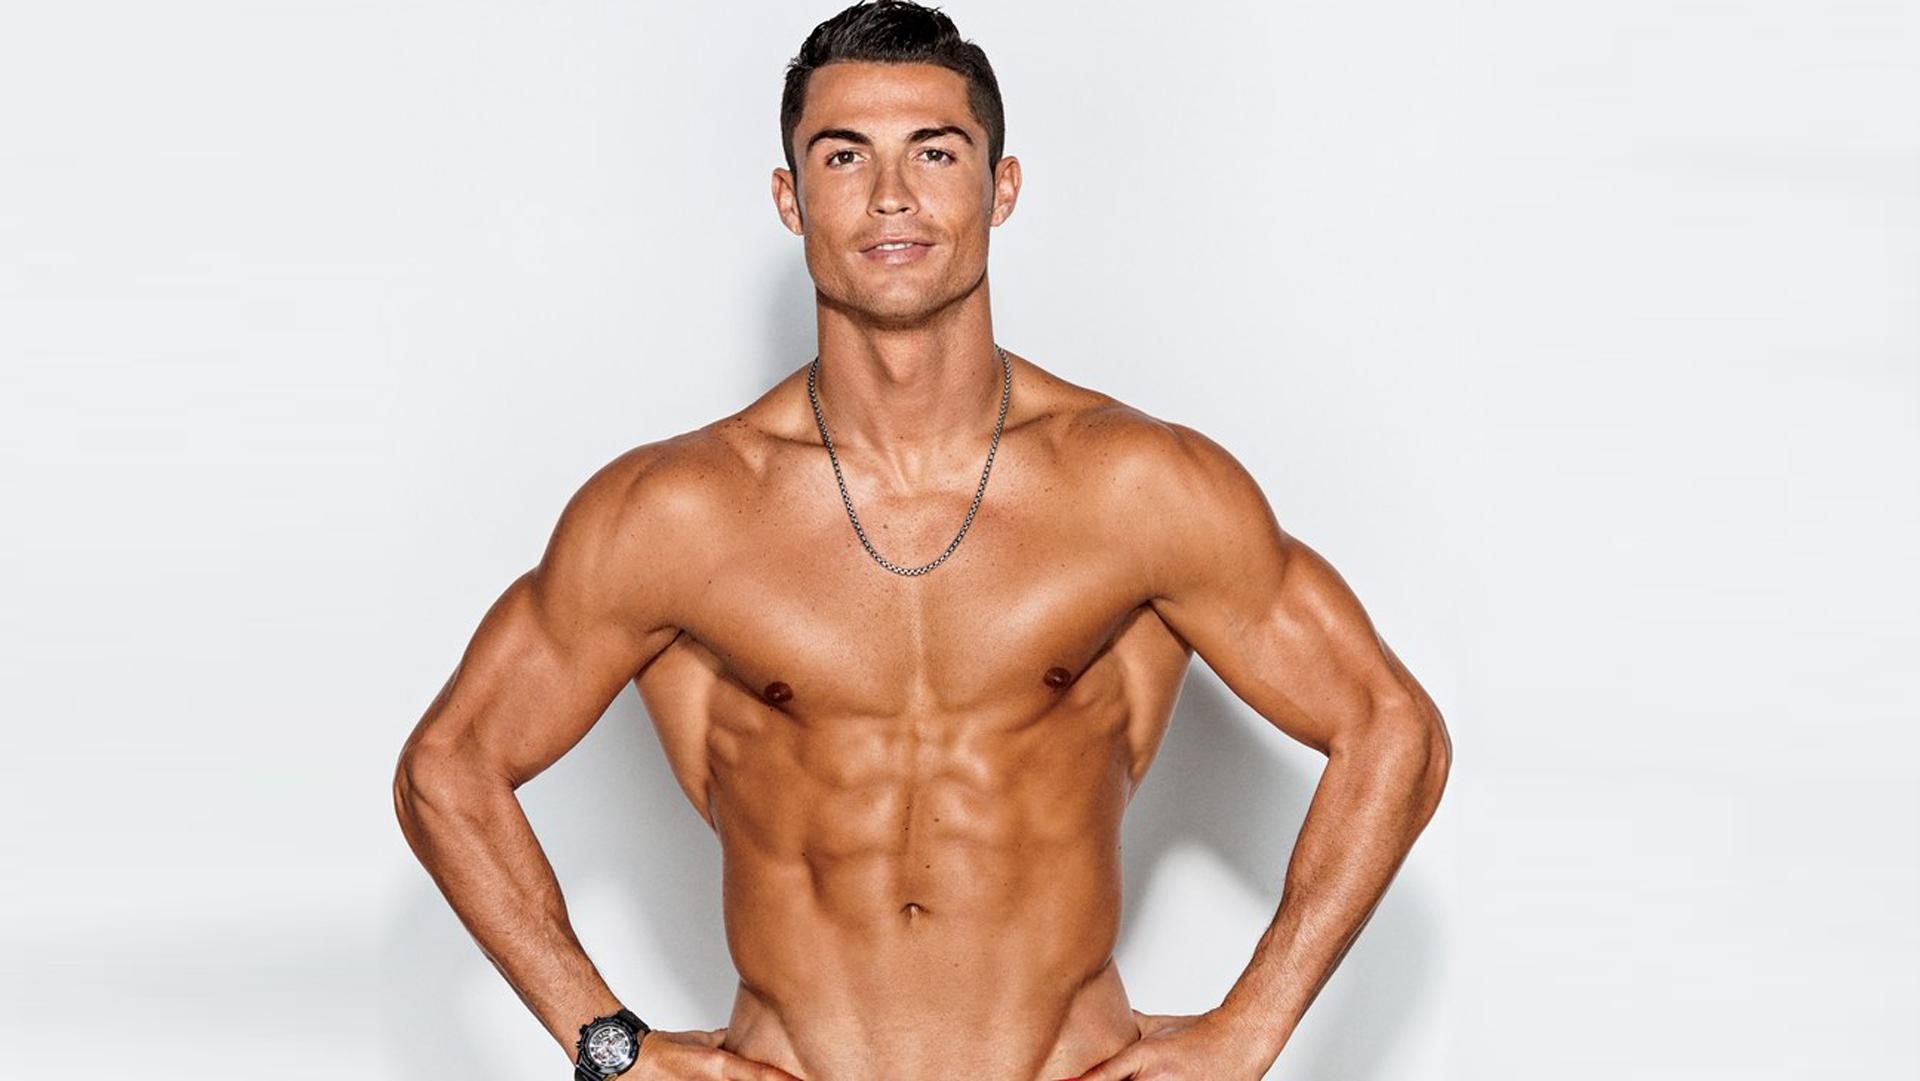 How cristianio ronaldo got ripped using these muscle - Homme le plus beau du monde ...